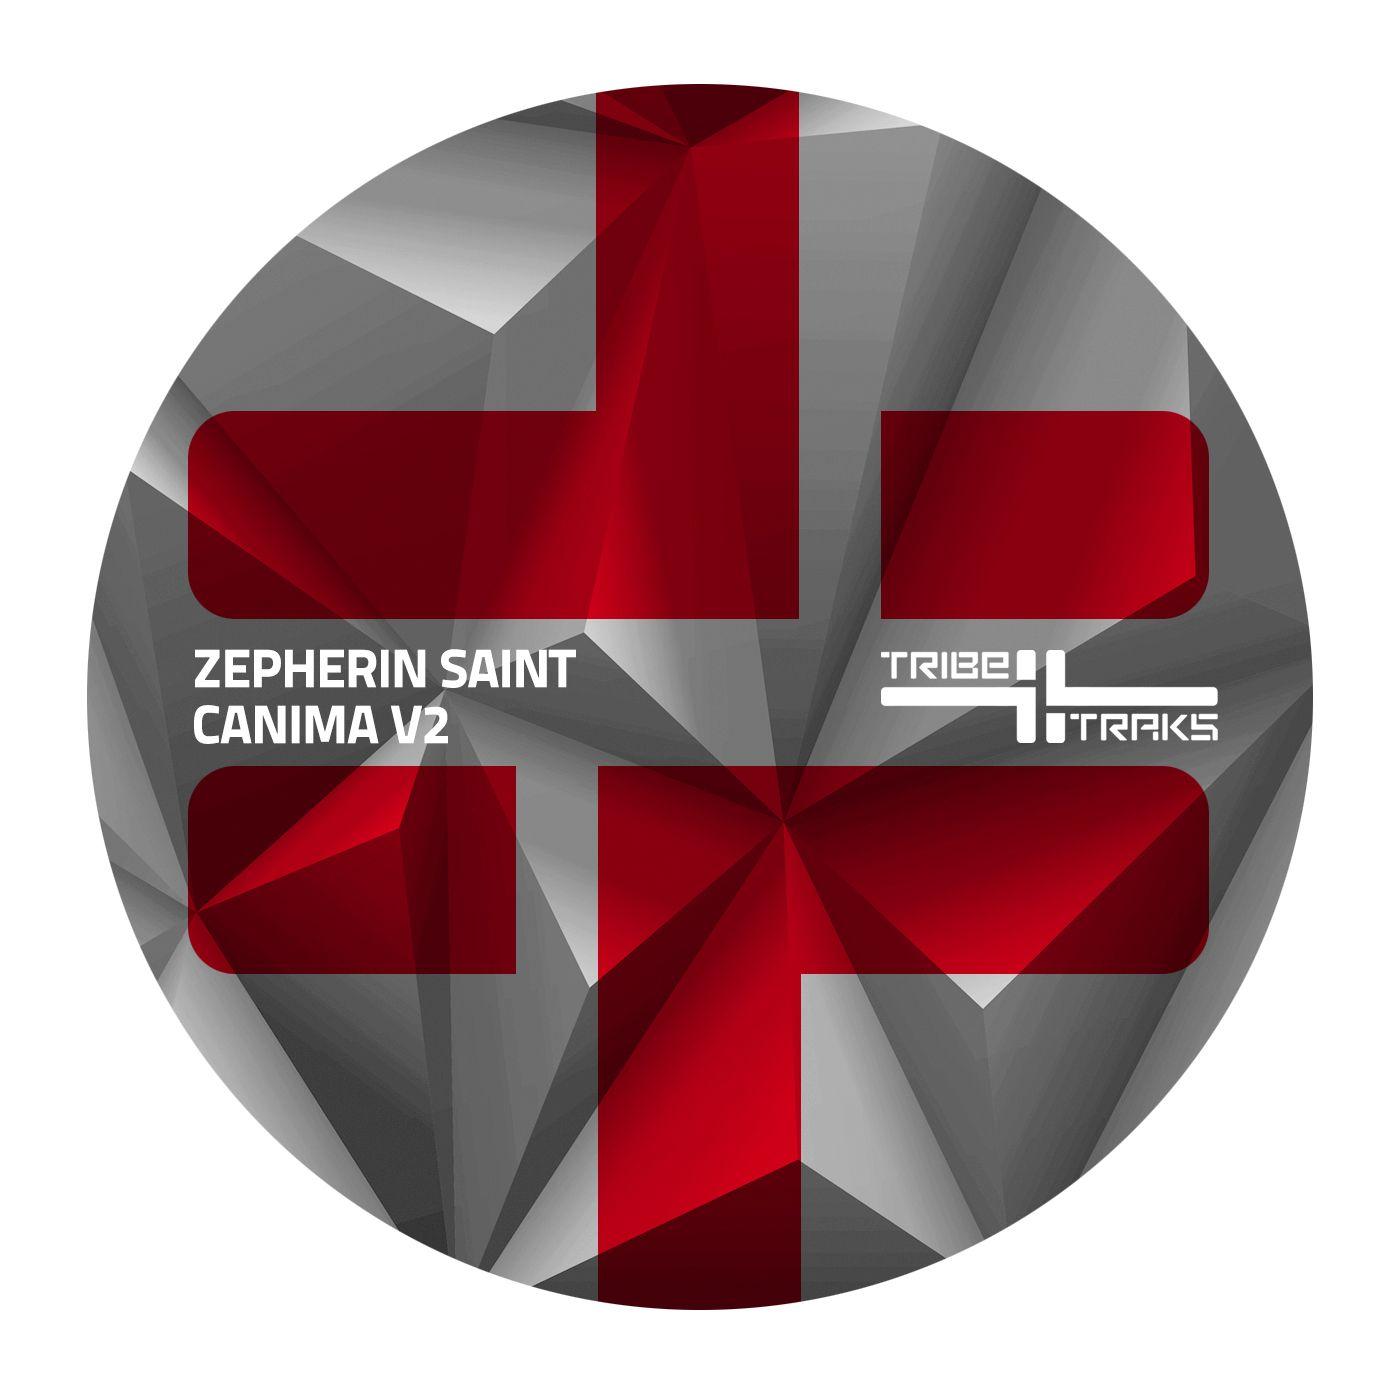 packshot_-_zepherin_saint_-_canima_v2_-_tribe_traks.jpg